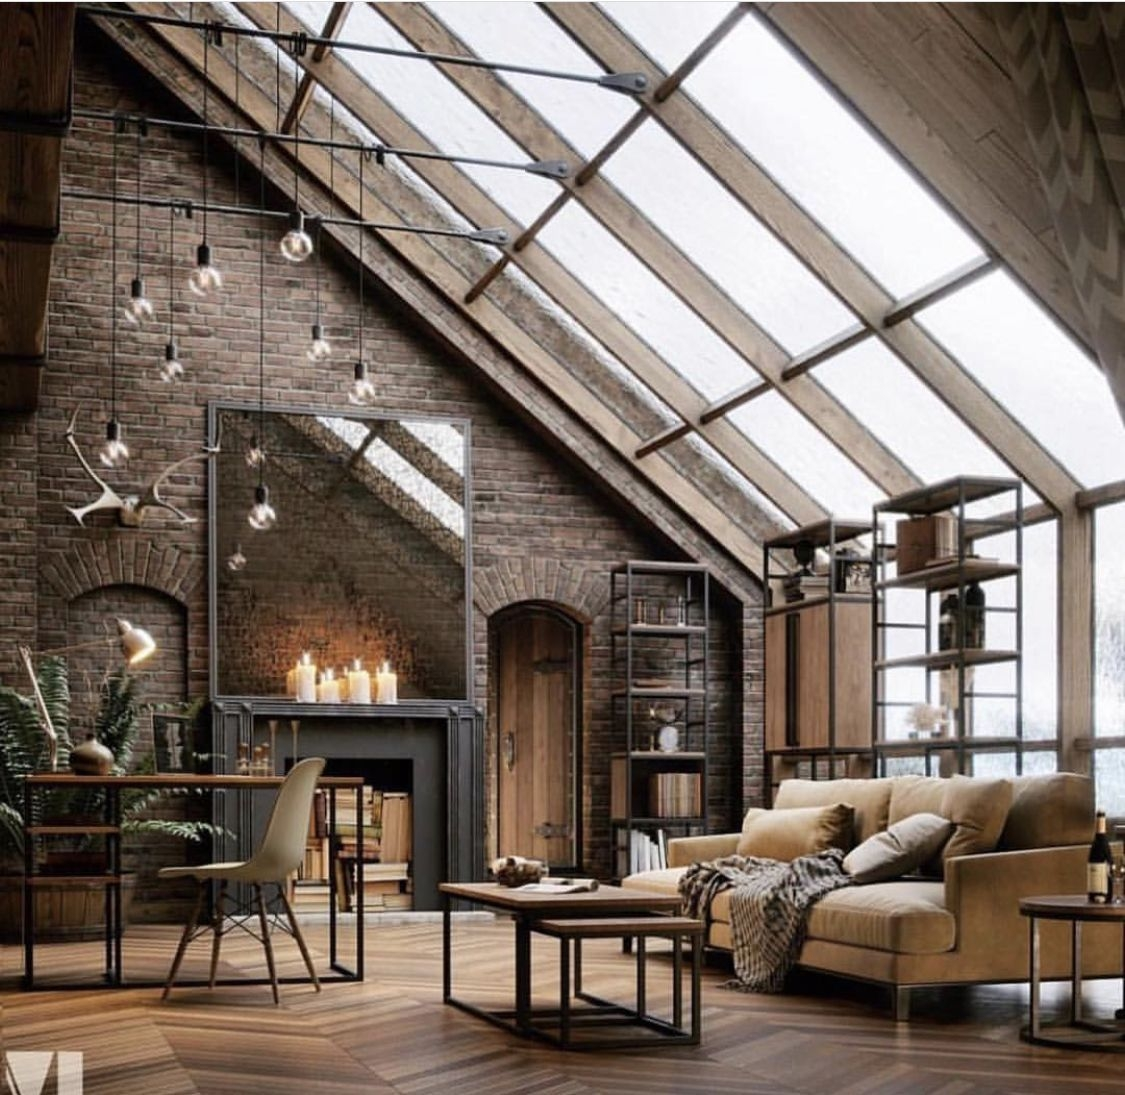 Gorgeous Natural Home Light Architecture Design Ideas02